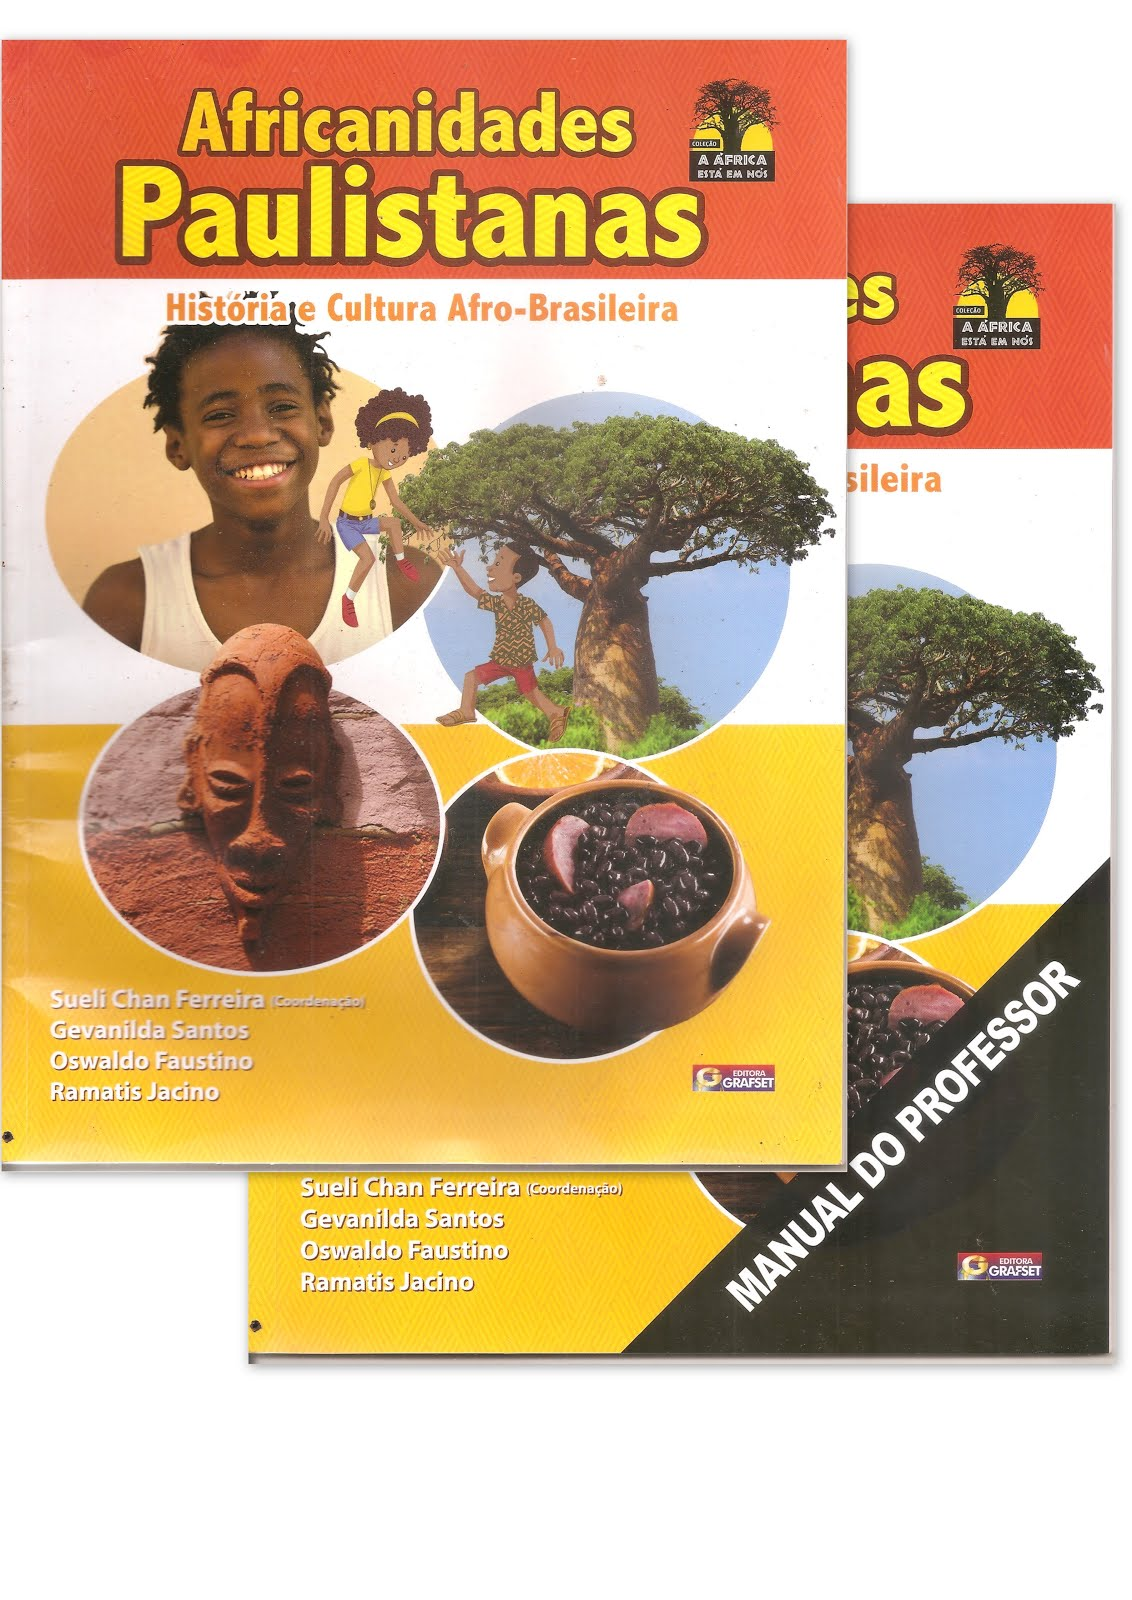 Africanidades Paulistanas